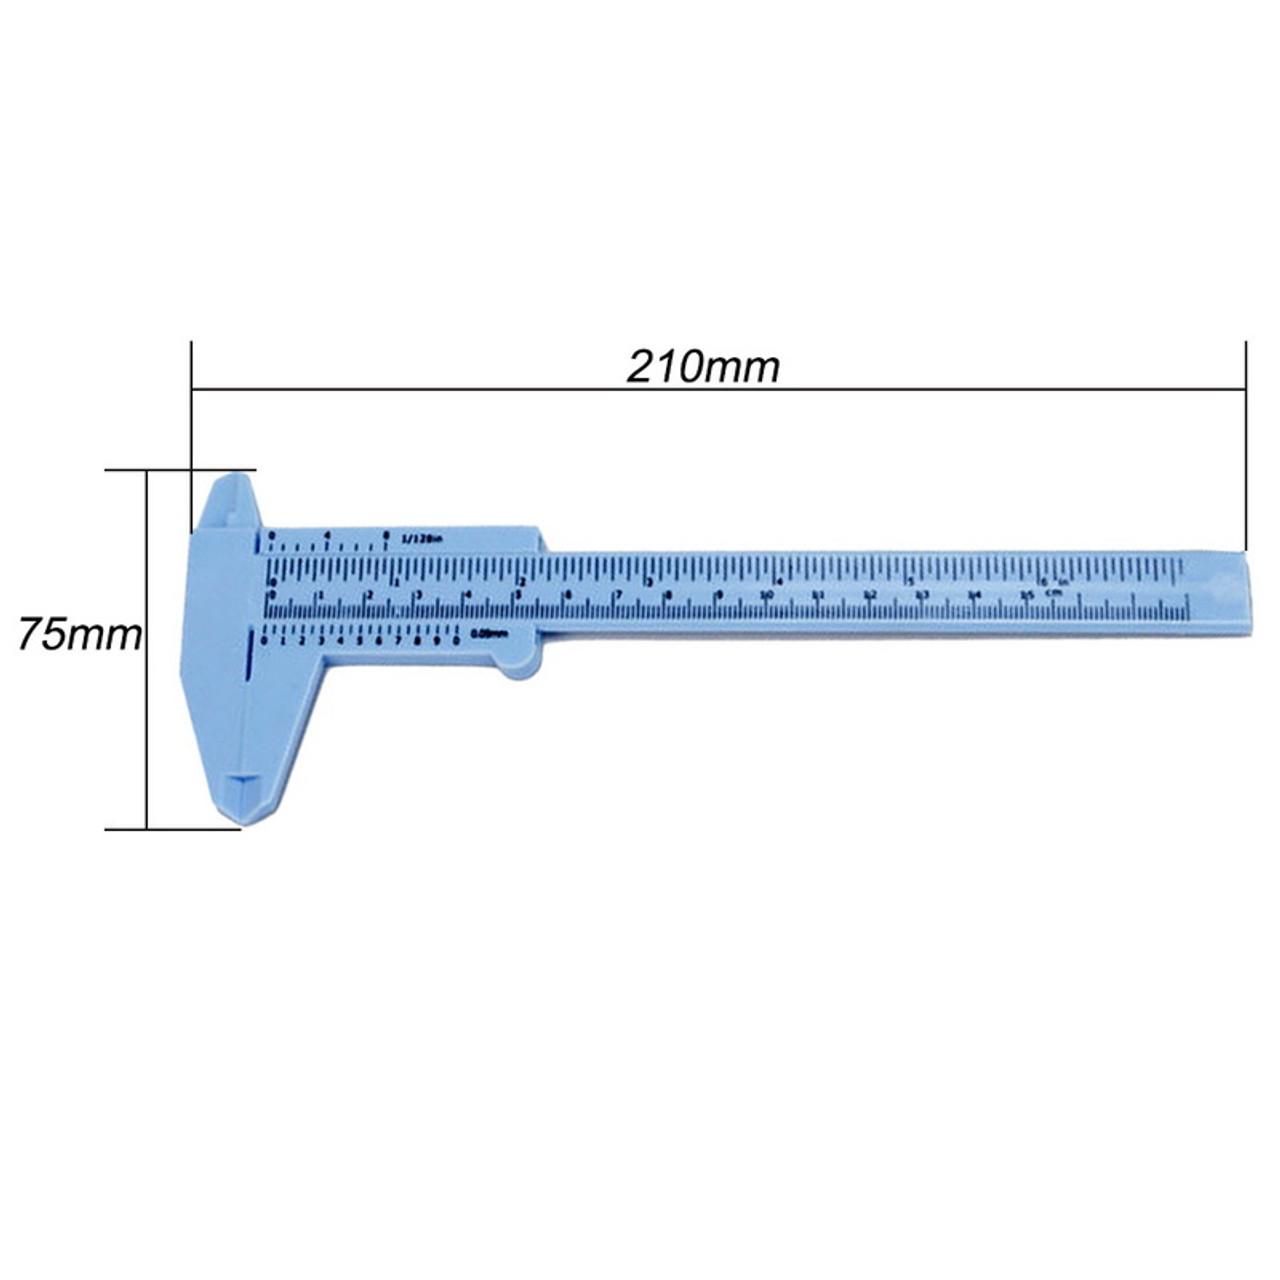 Specifications of the plastic Vernier Caliper